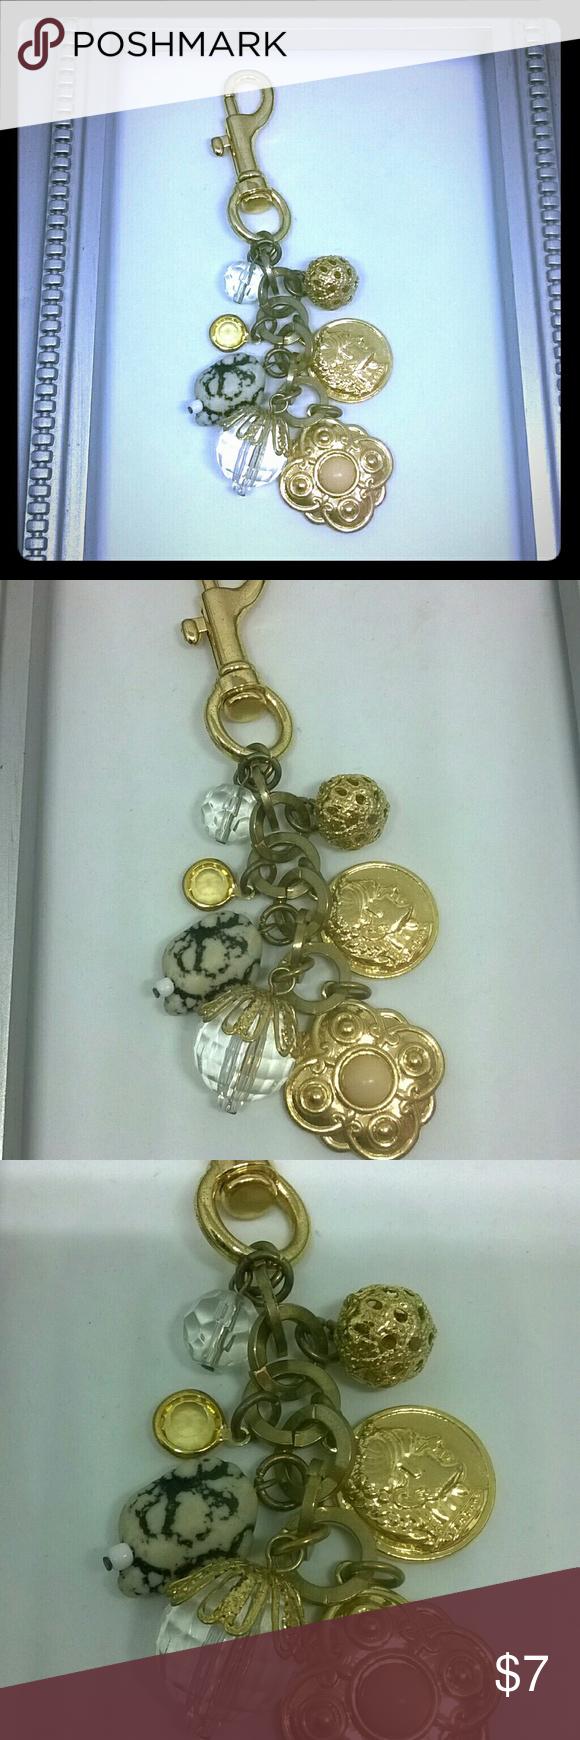 Gold charm keychain or purse charm Gold charm keychain or purse charm Mia Other